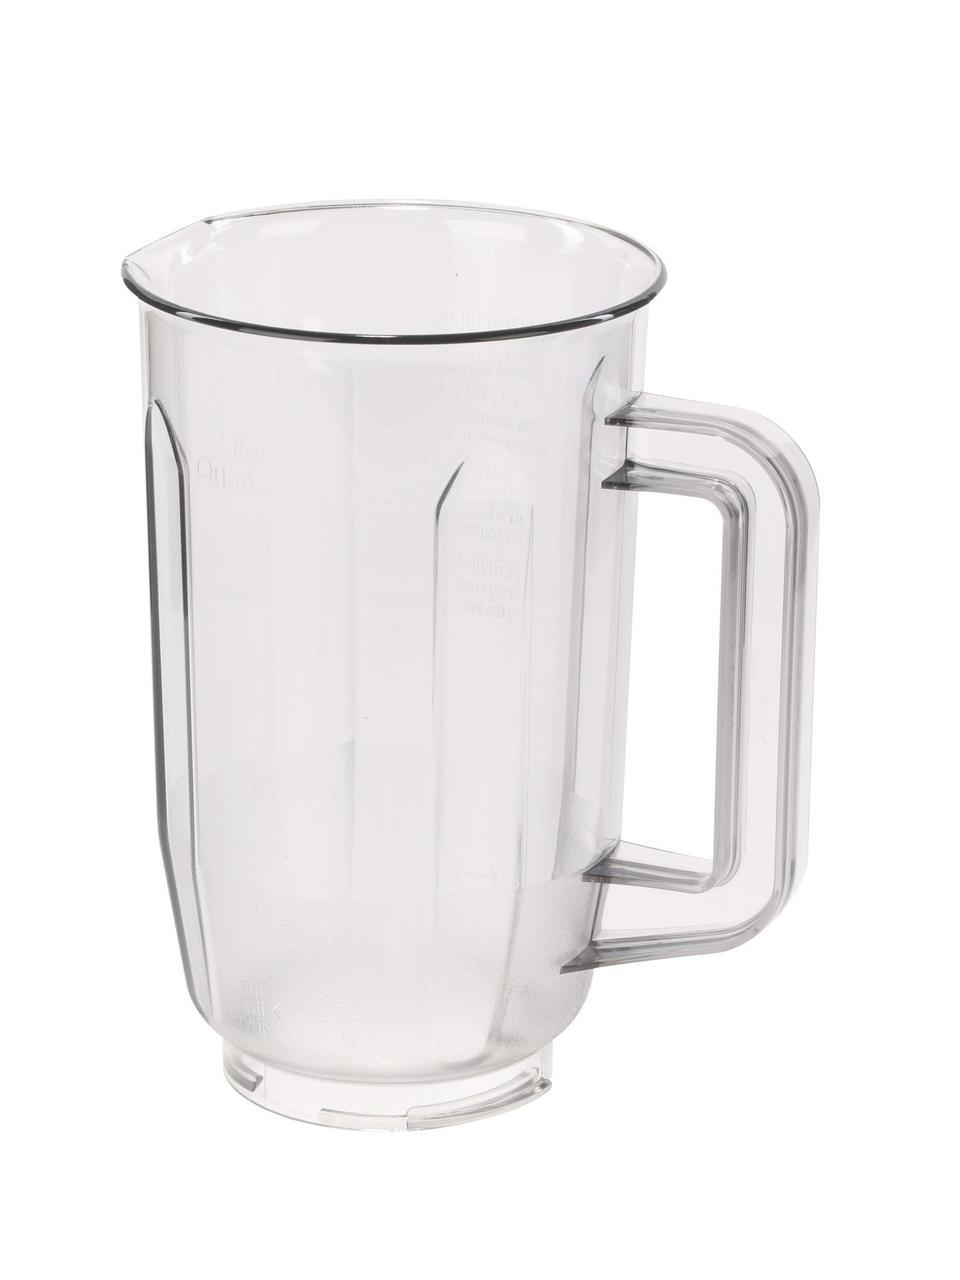 Чаша блендера для кухонного комбайна Bosch, Siemens 00656683